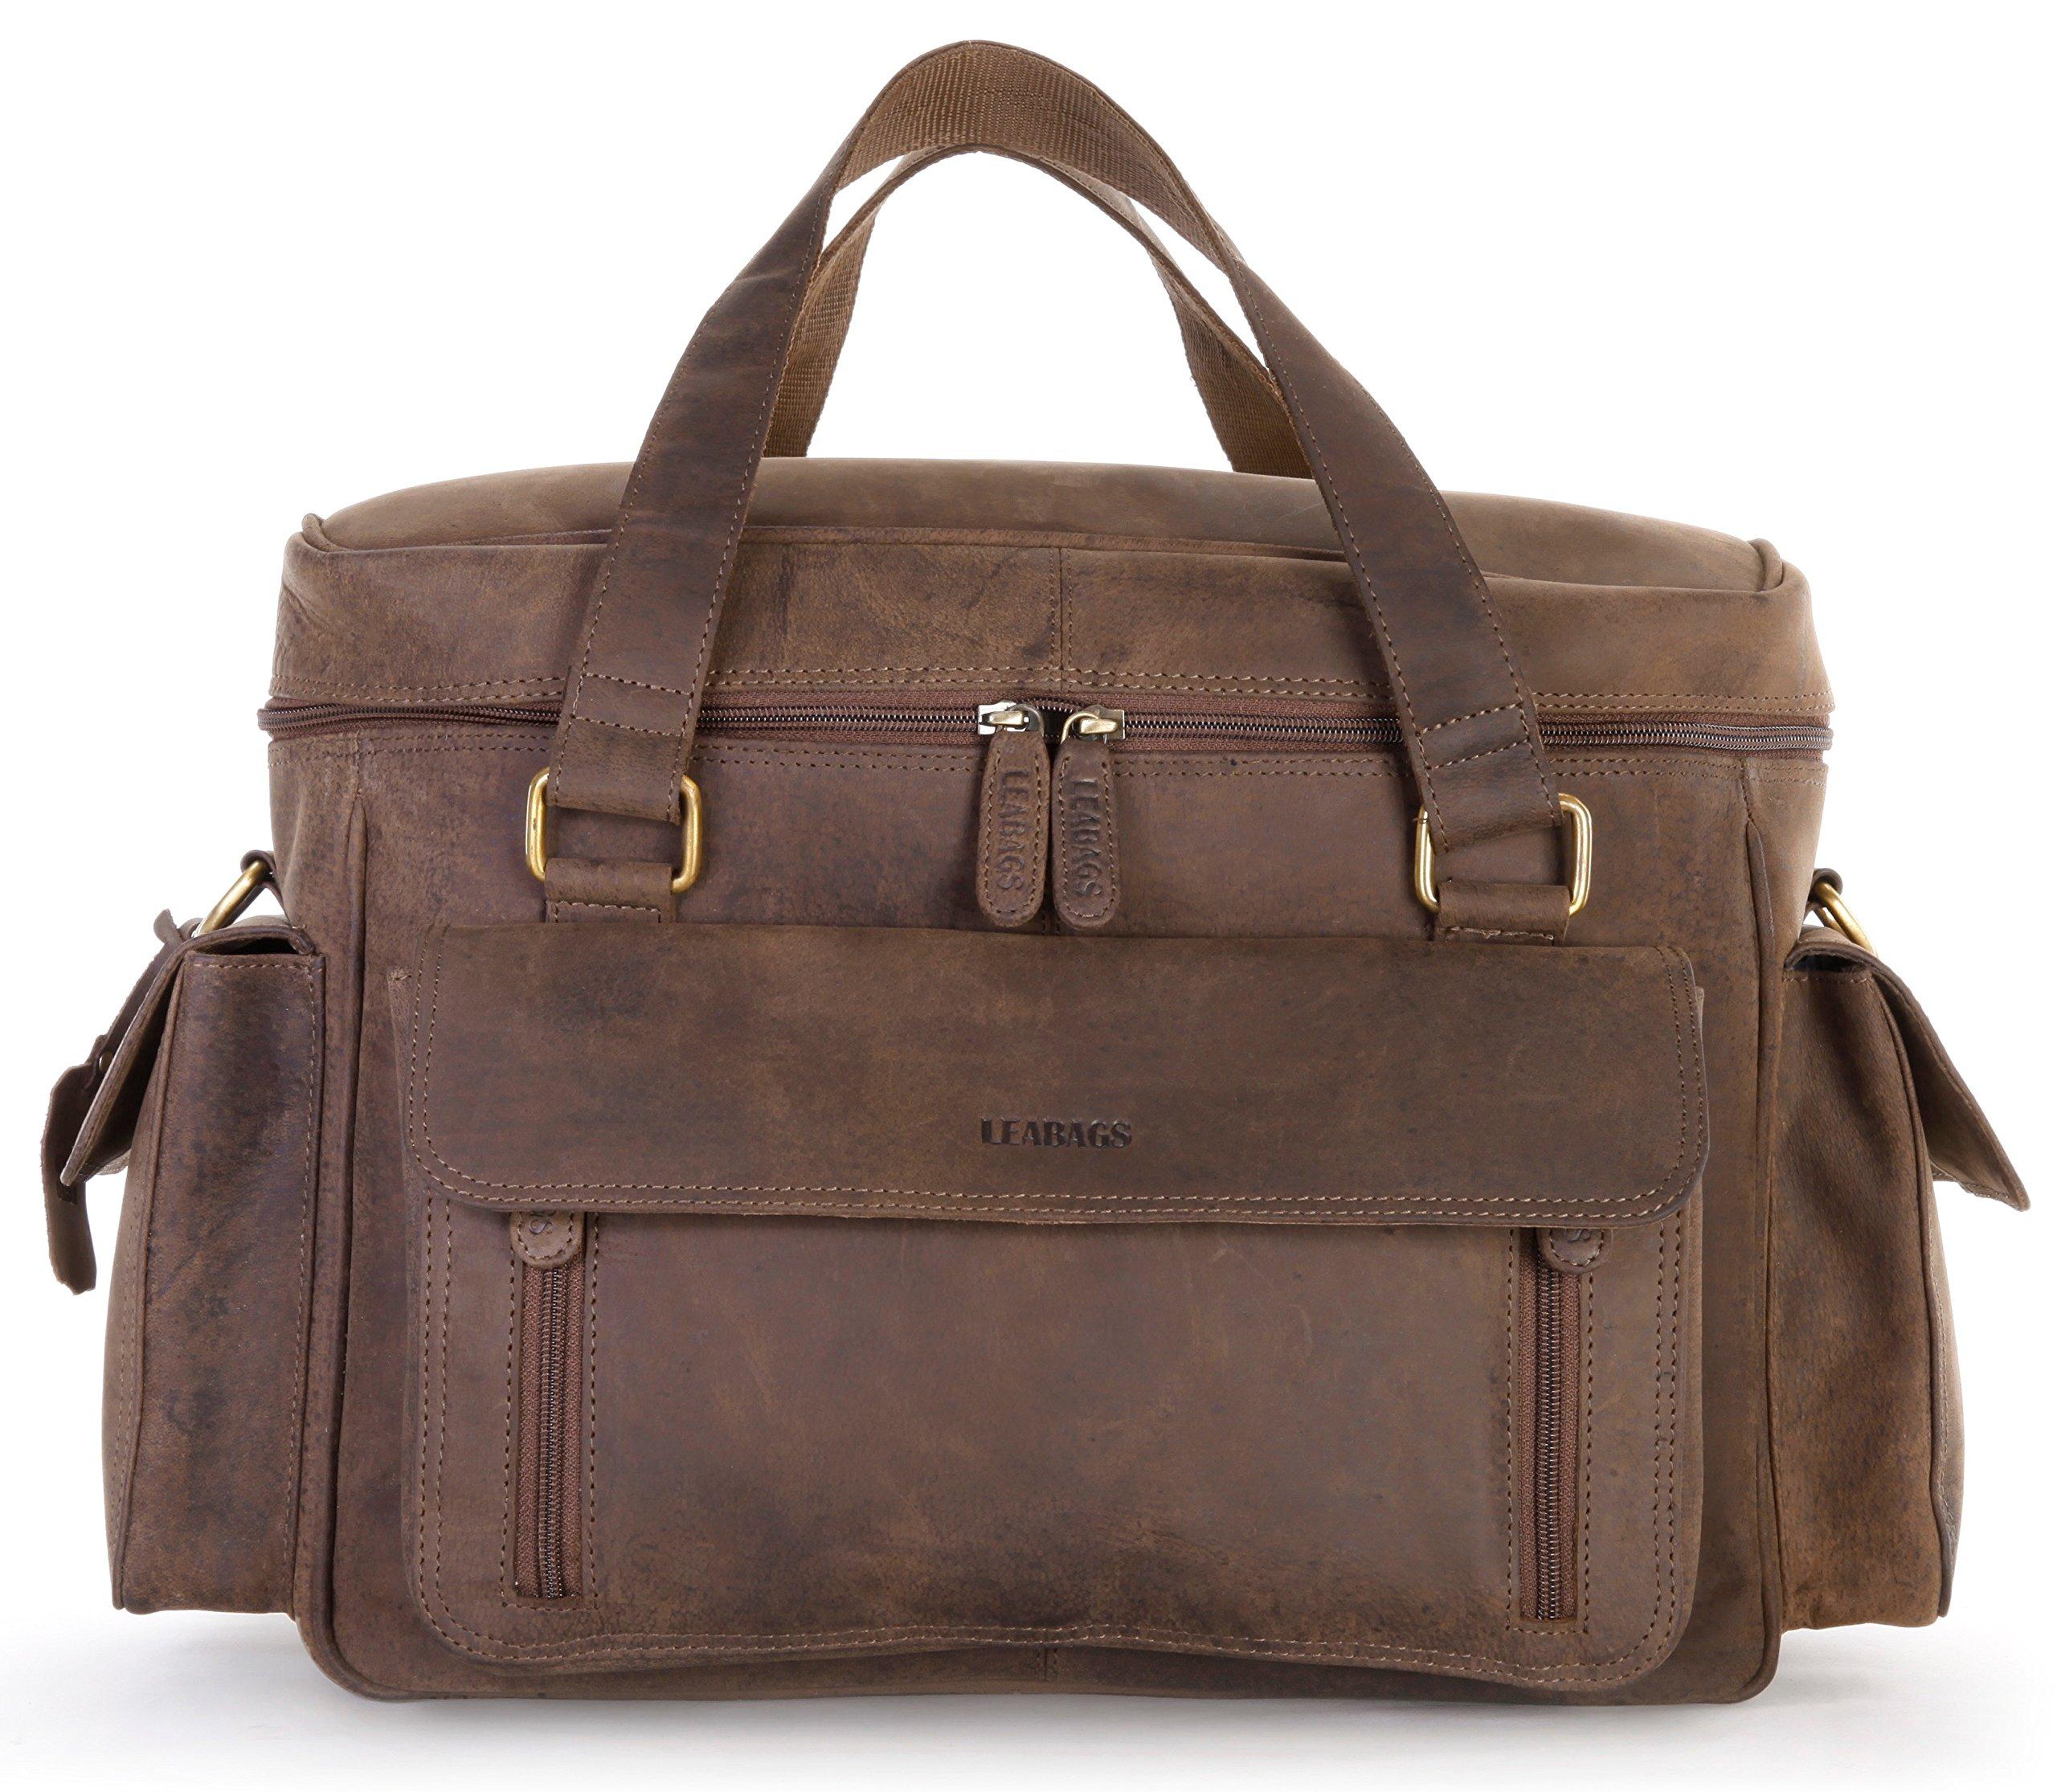 LEABAGS Zens genuine buffalo leather camera bag in vintage style - Nutmeg